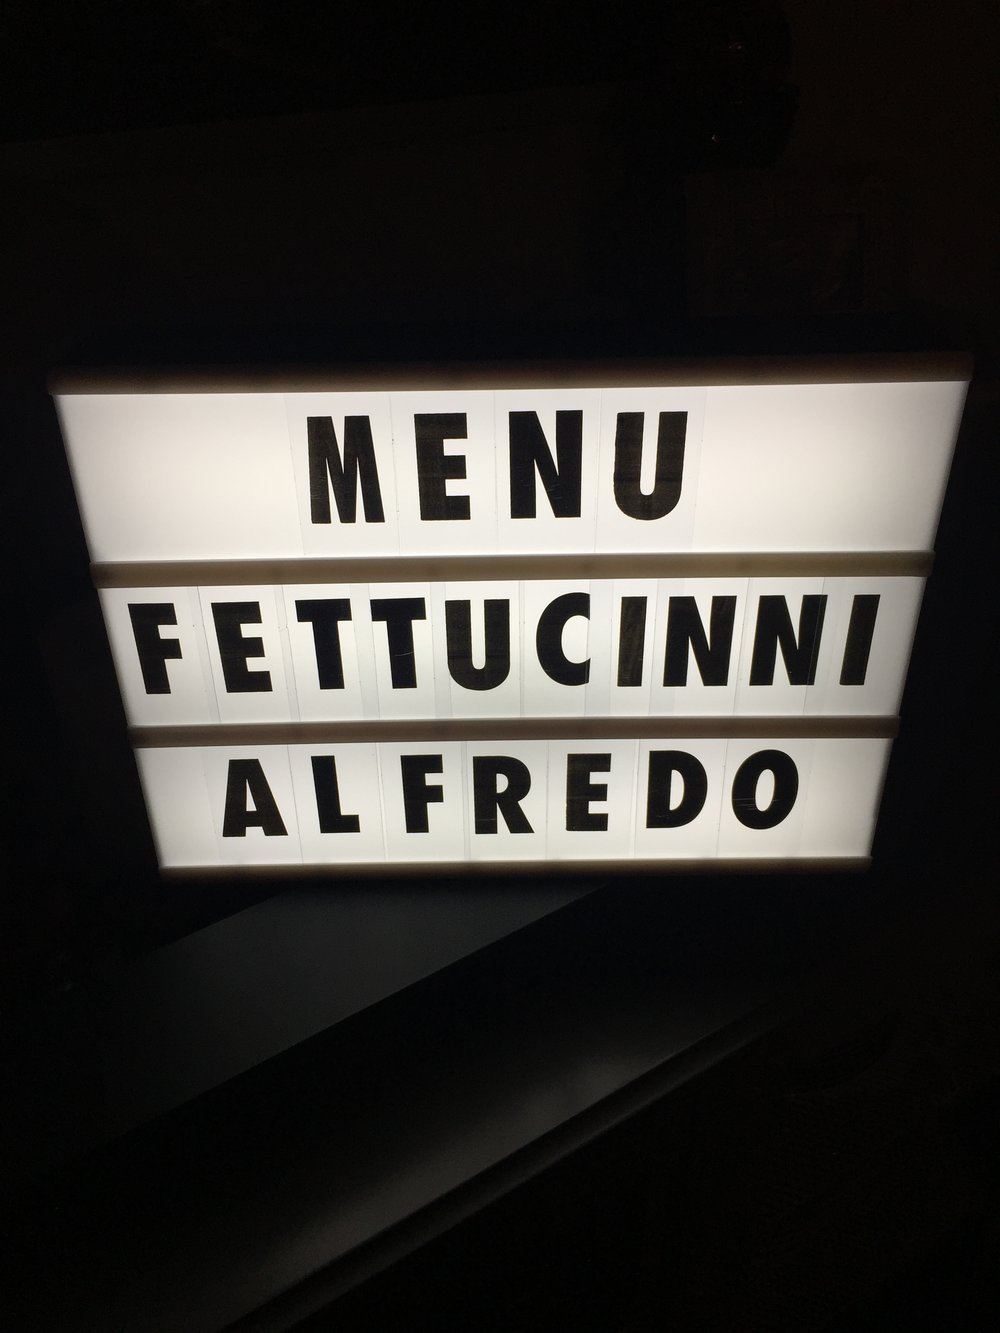 43FettuciniAlfredo1.JPG